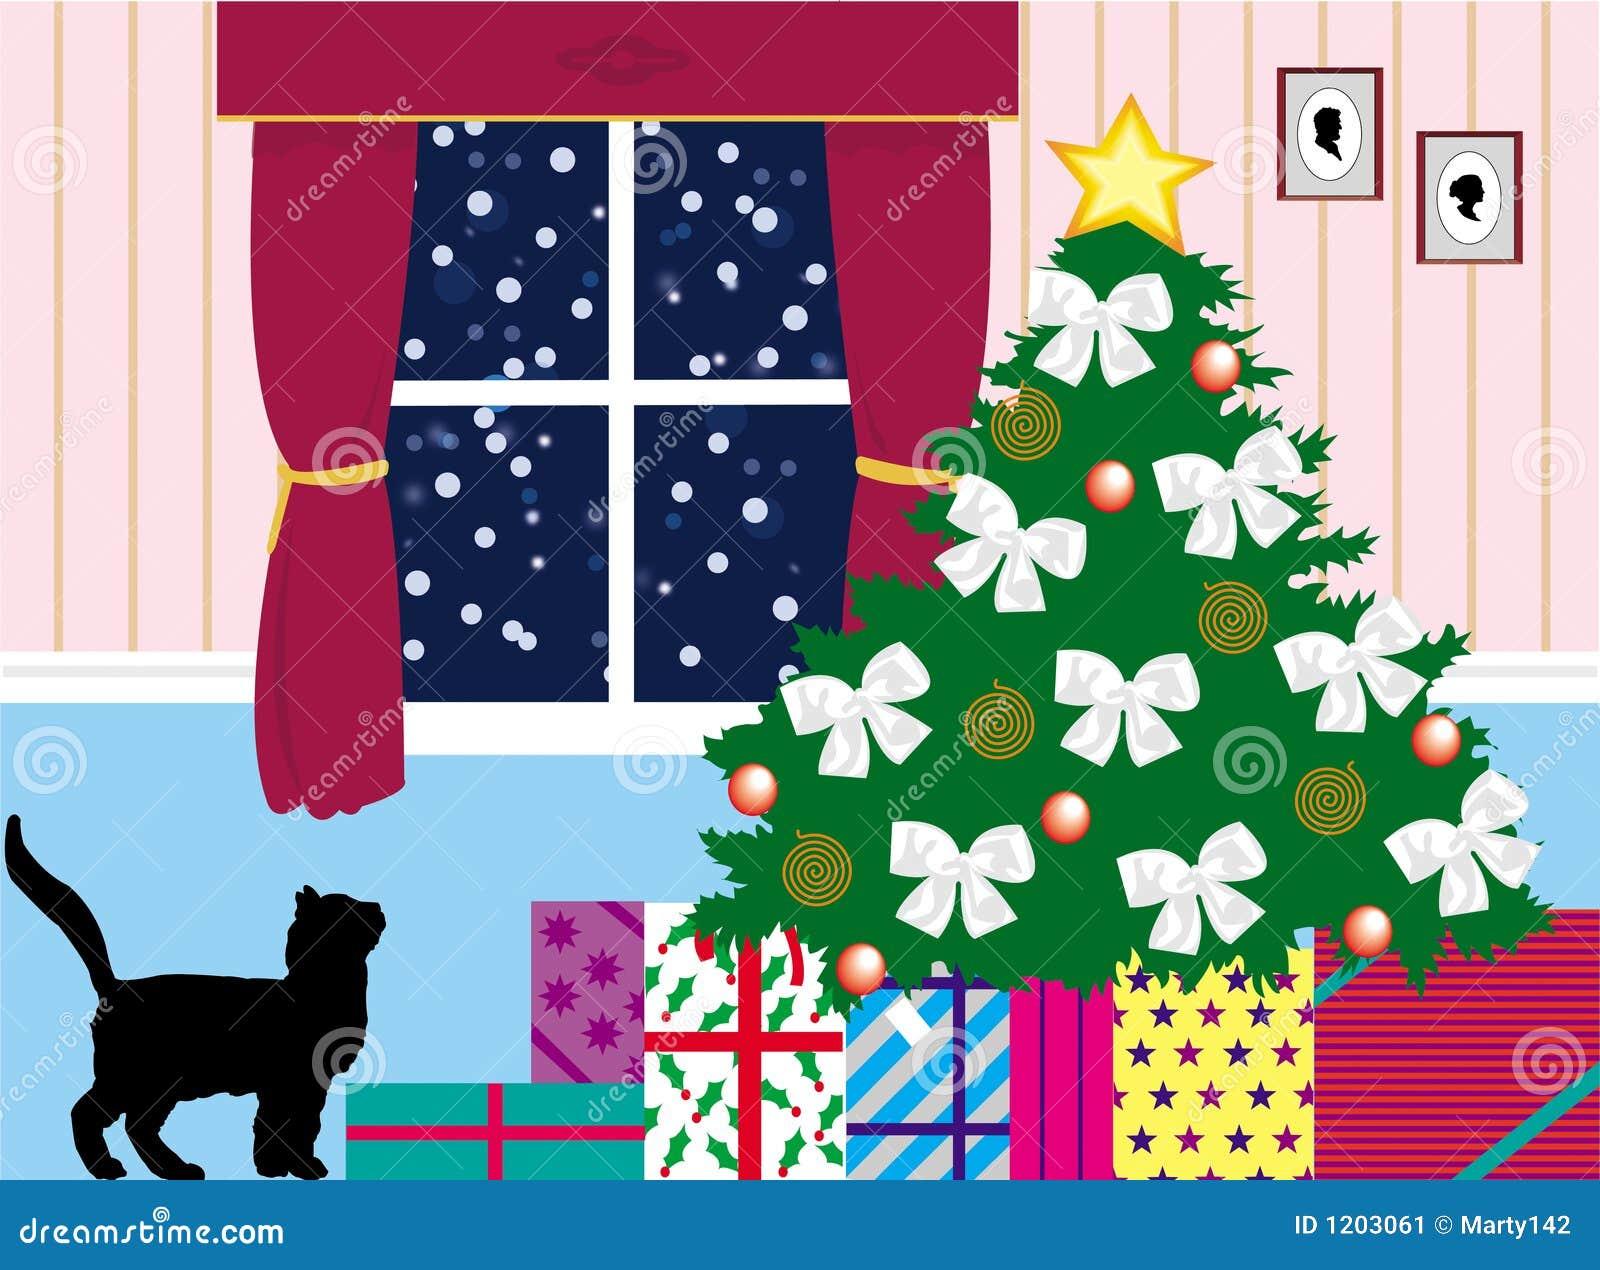 Presents under the tree